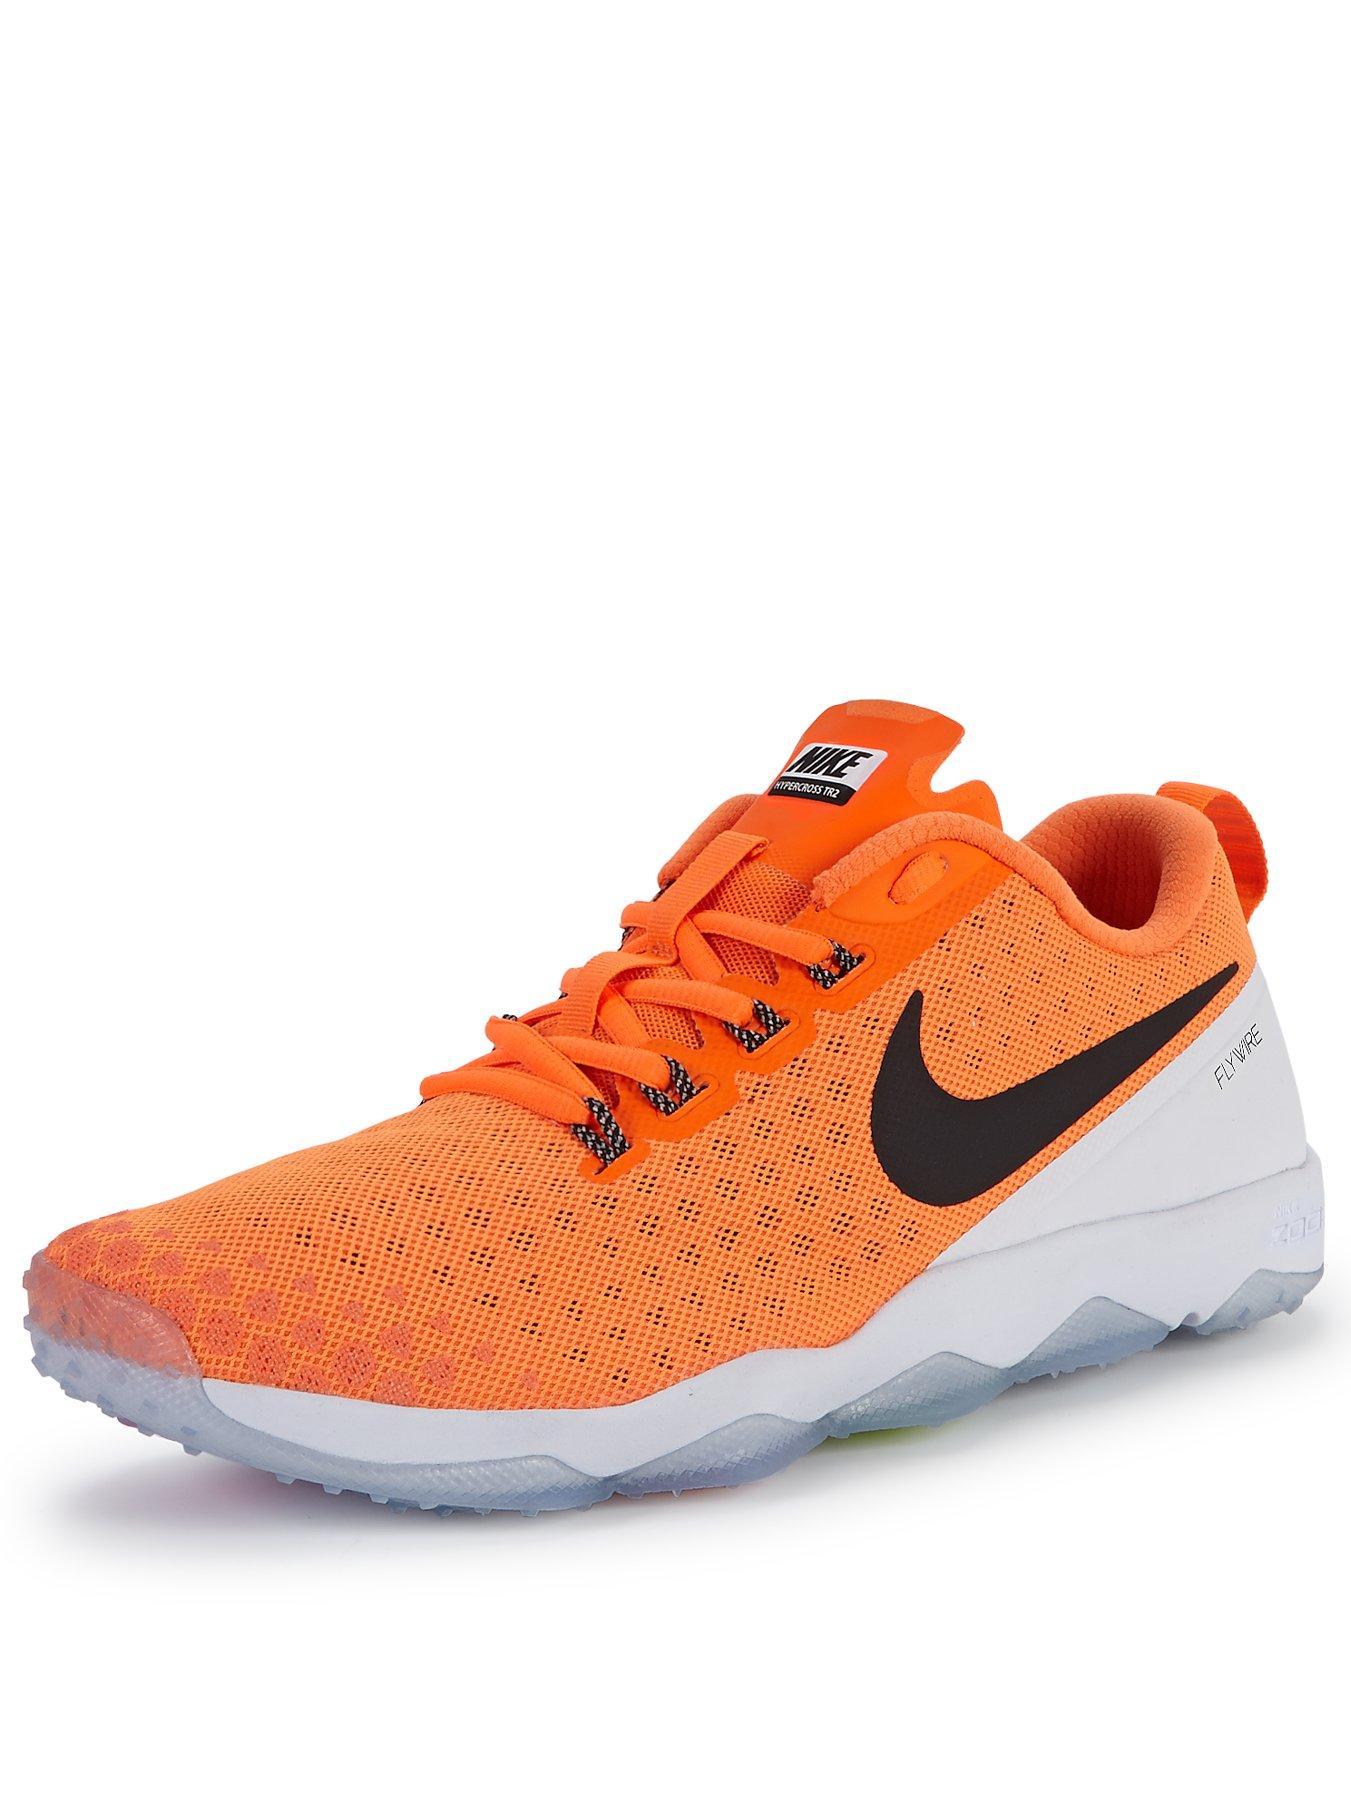 nike free trainer 3.0 v3; black fridaynike free 3.0 v4 price in india girls  black free shoes